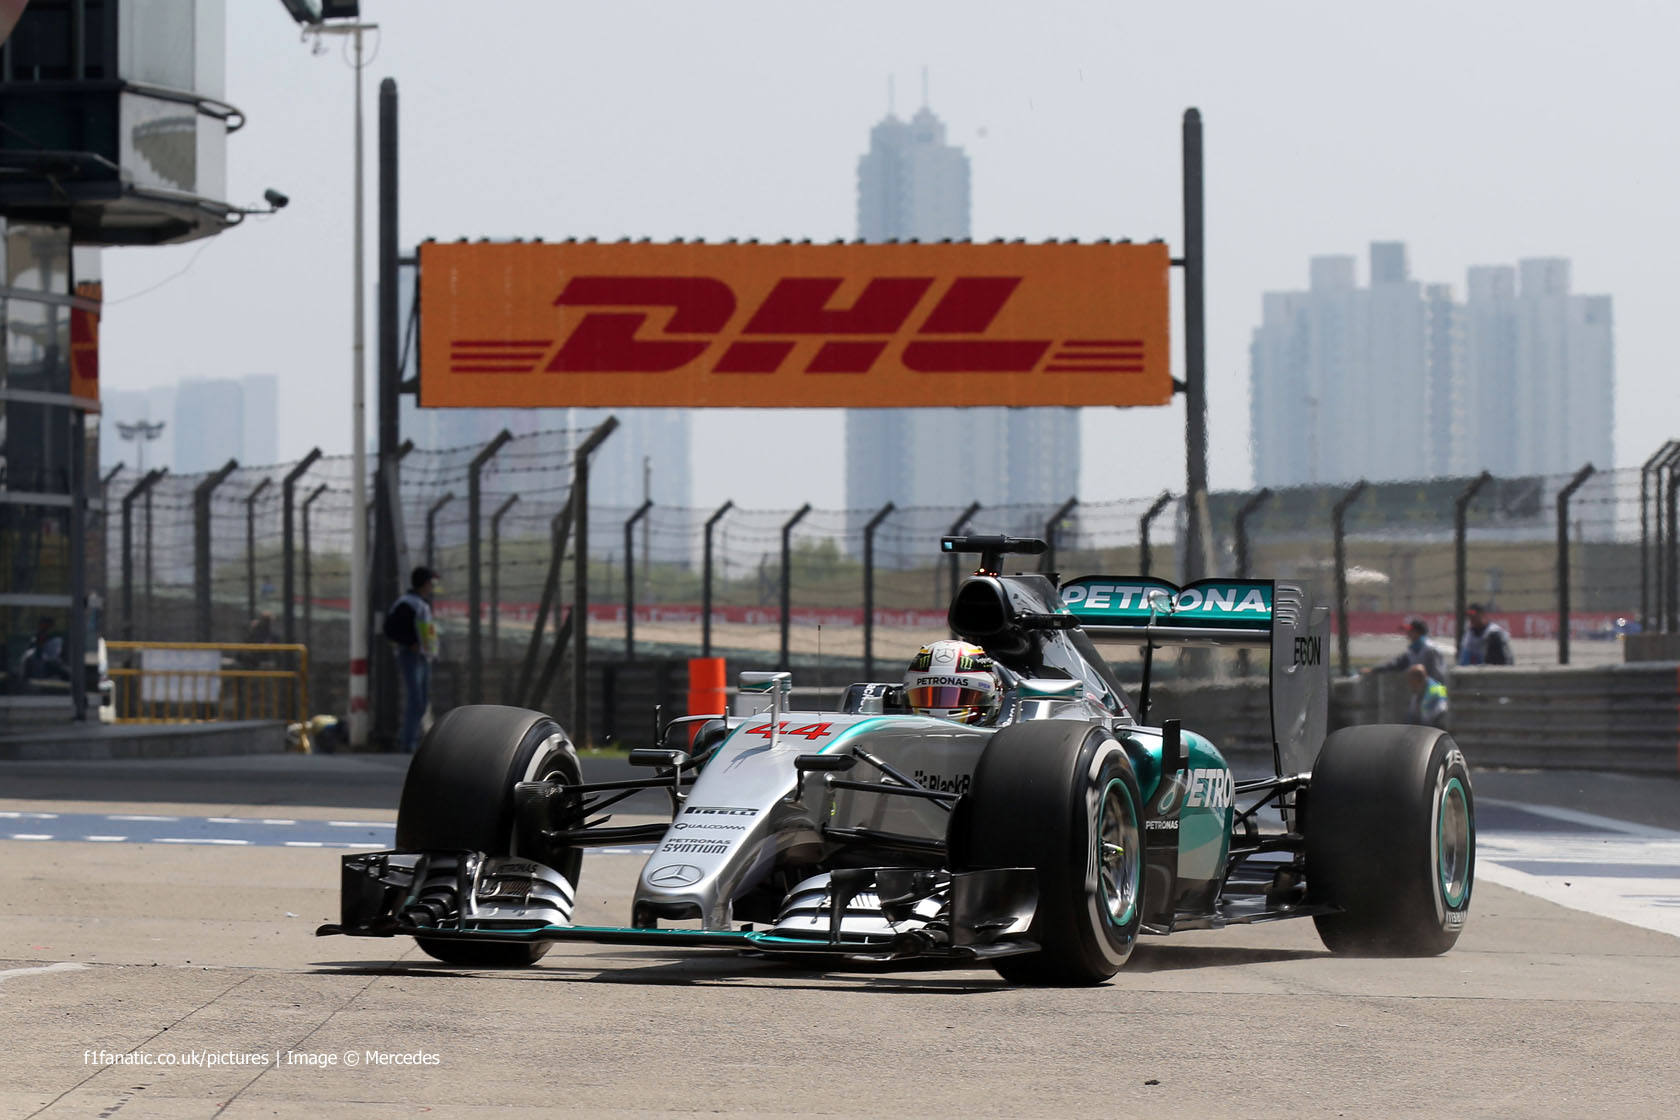 Lewis Hamilton, Mercedes, Shanghai International Circuit, 2015